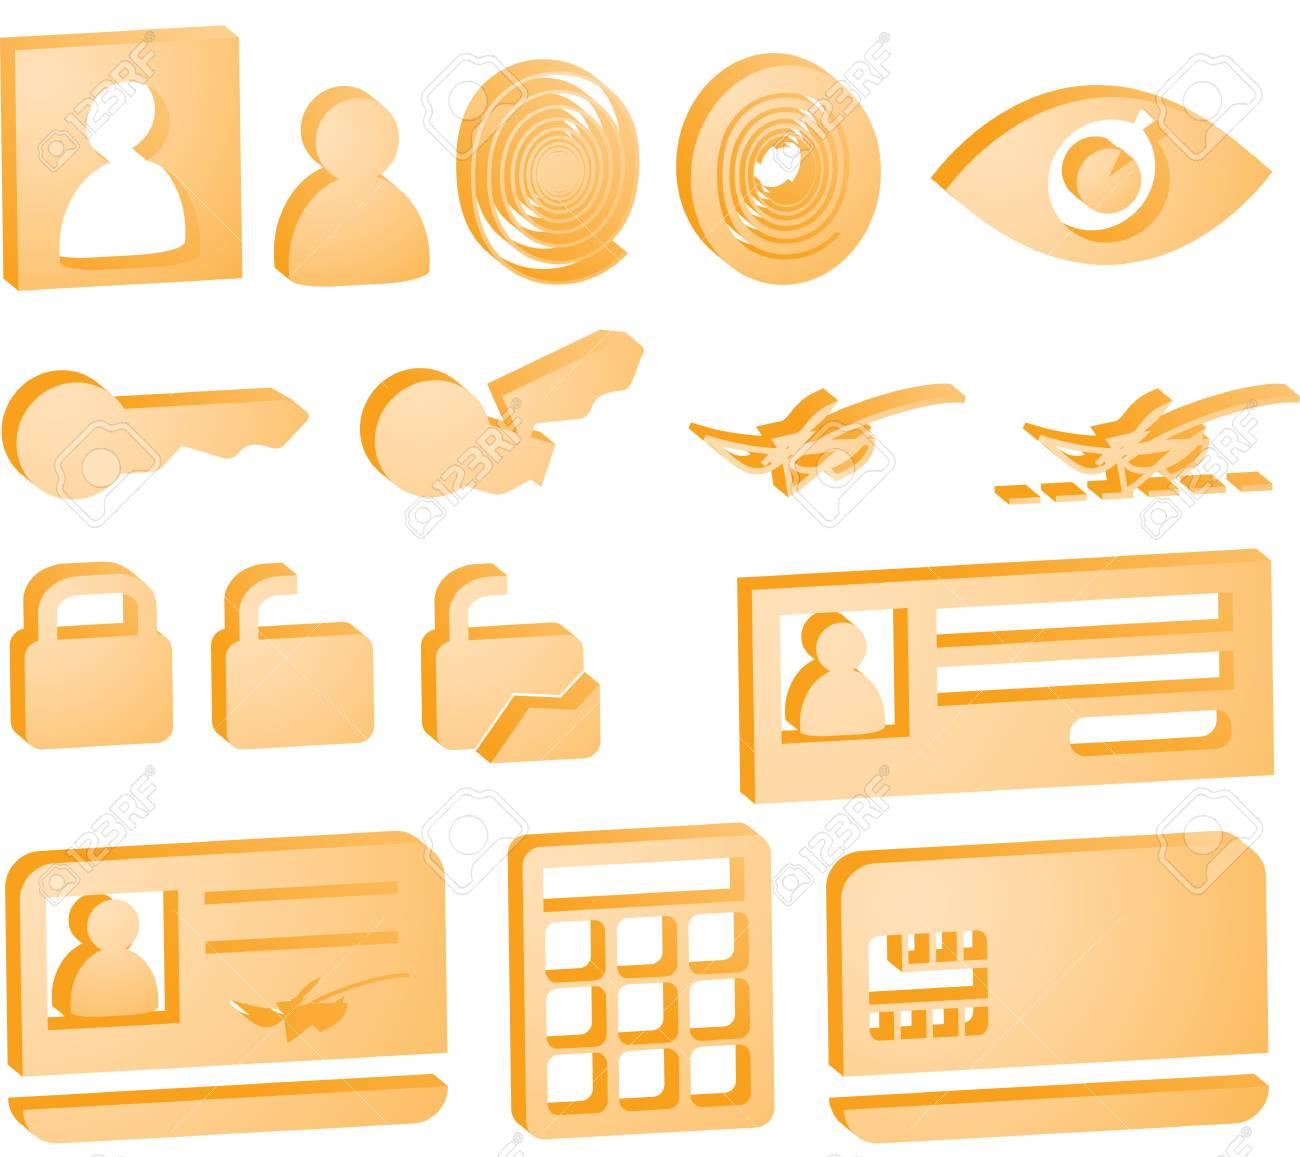 Security icon button illustration set, 3d style look Stock Illustration - 6706142